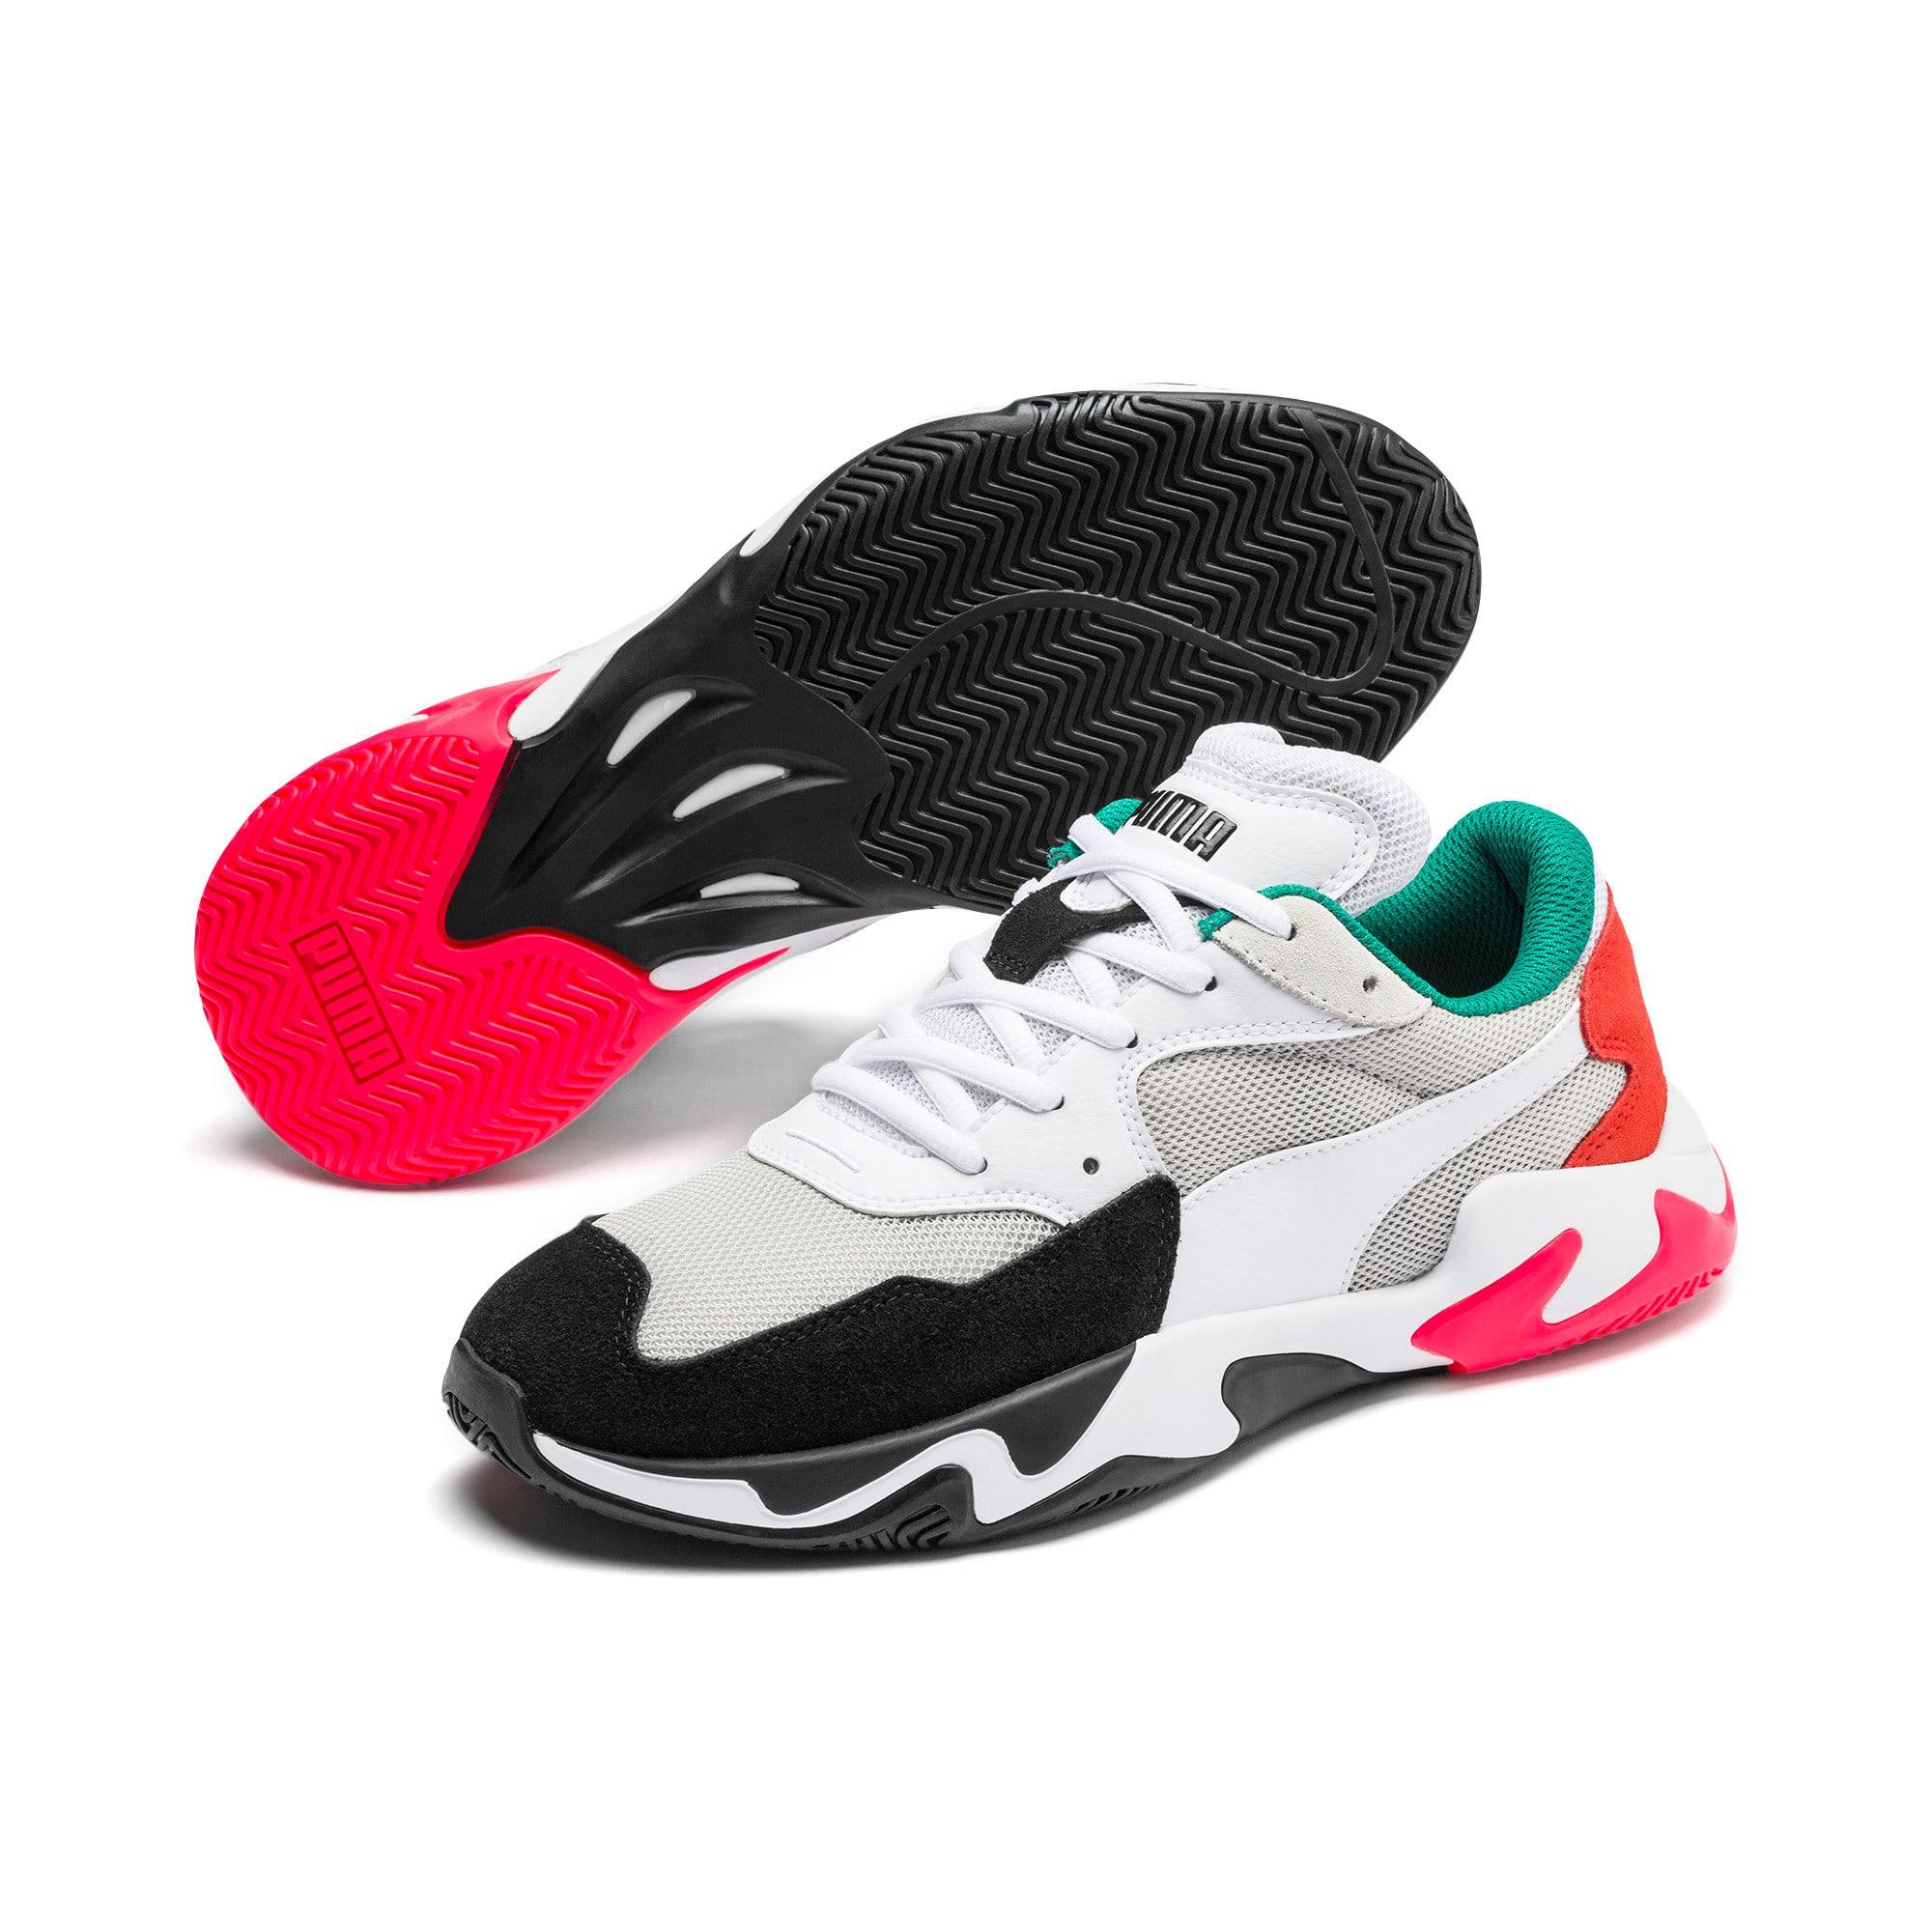 Thumbnail 3 of Storm Adrenaline Sneaker, Puma Black-Gray Violet, medium